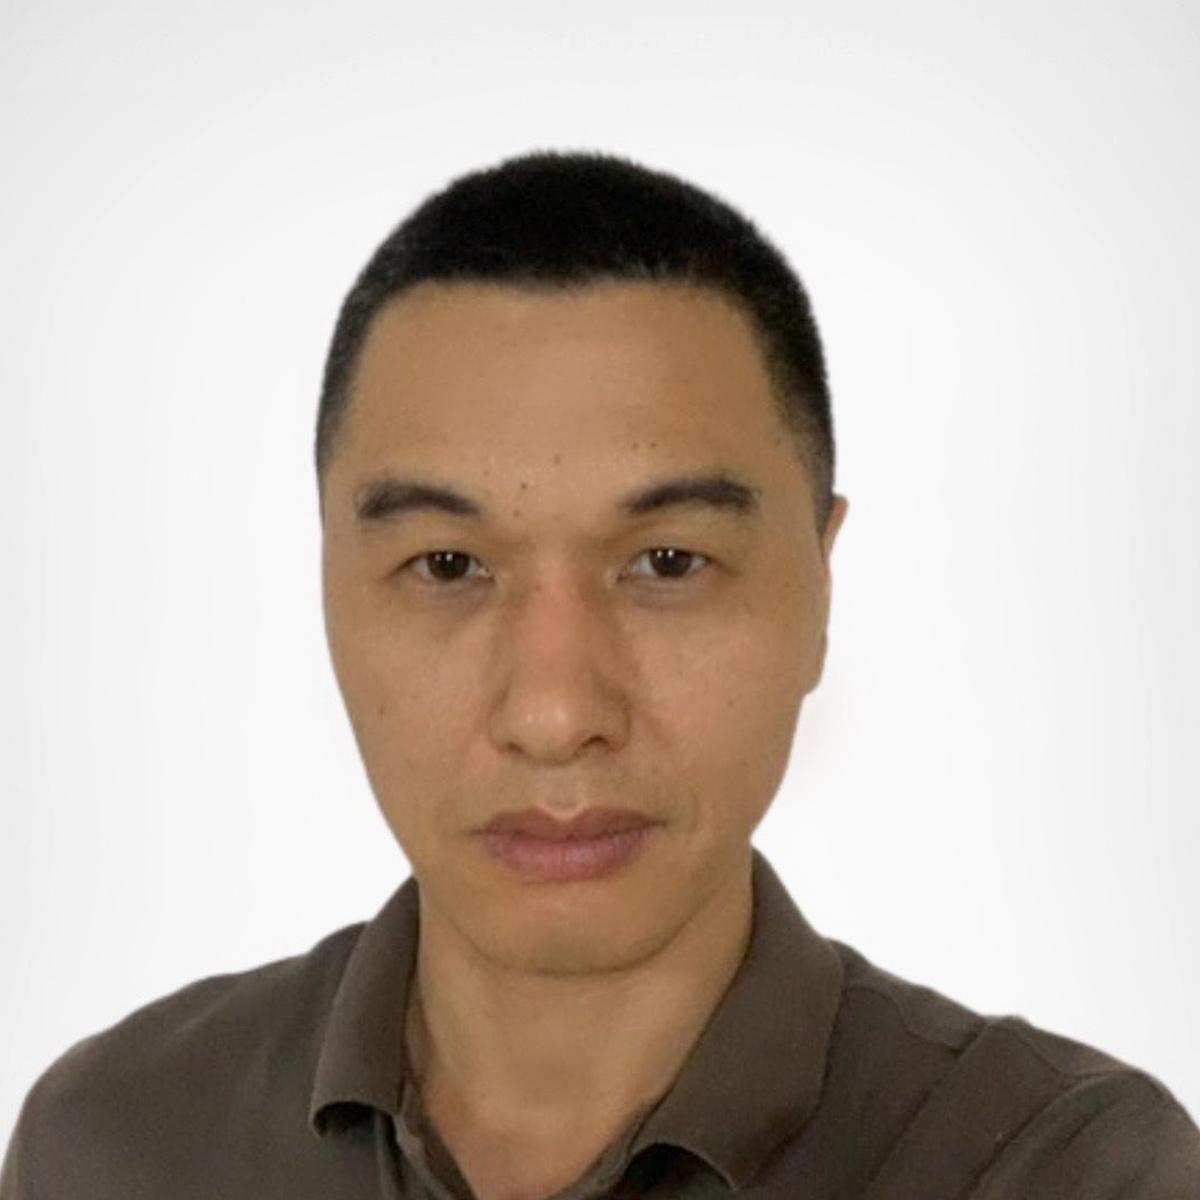 Photo of Ricky Chen